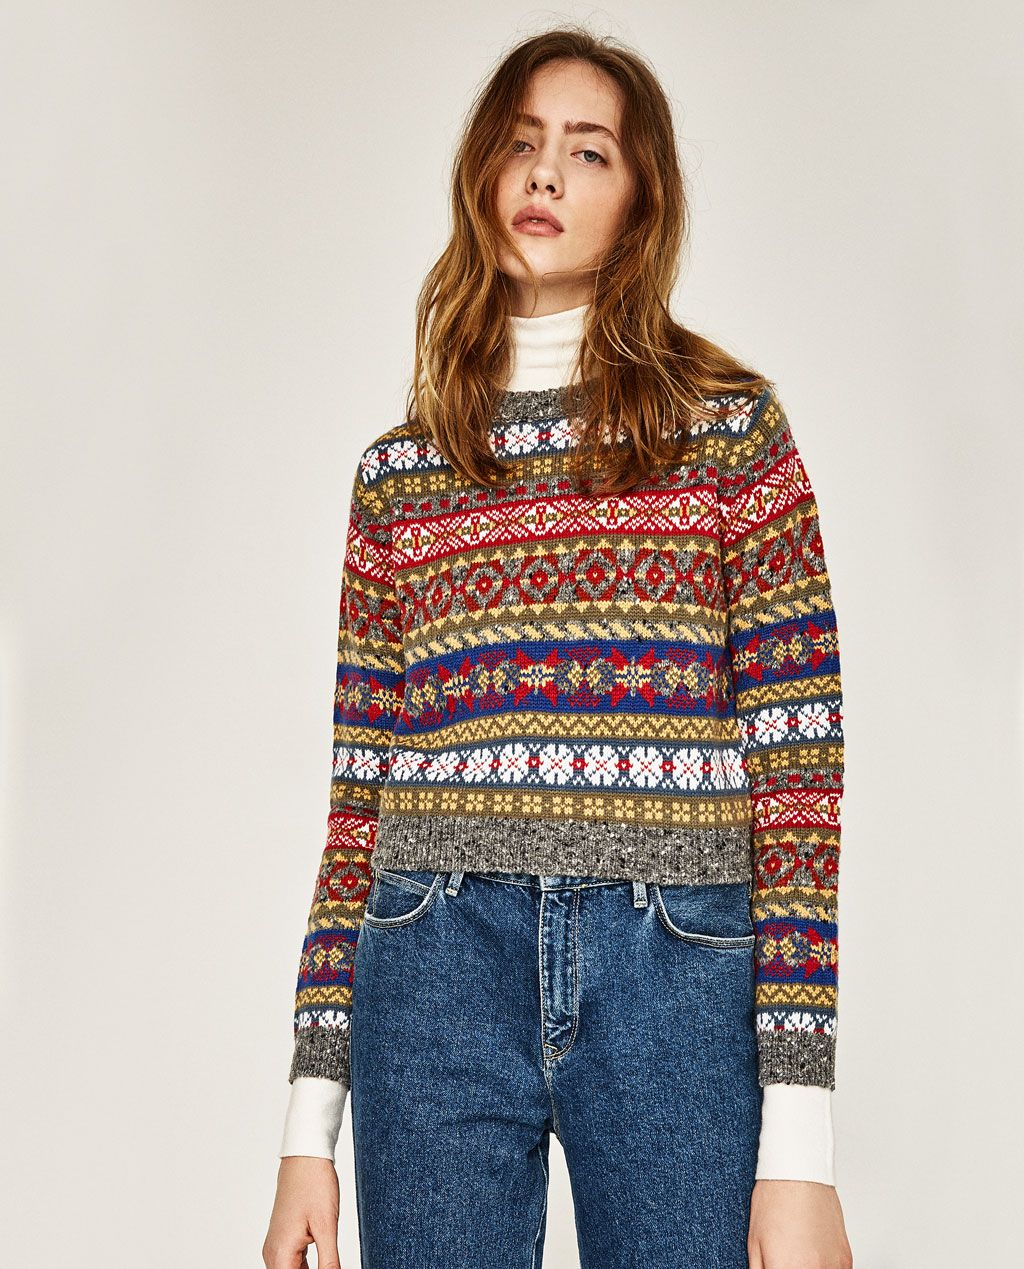 CROPPED JACQUARD SWEATER | Style. | Pinterest | Of, Zara united ...